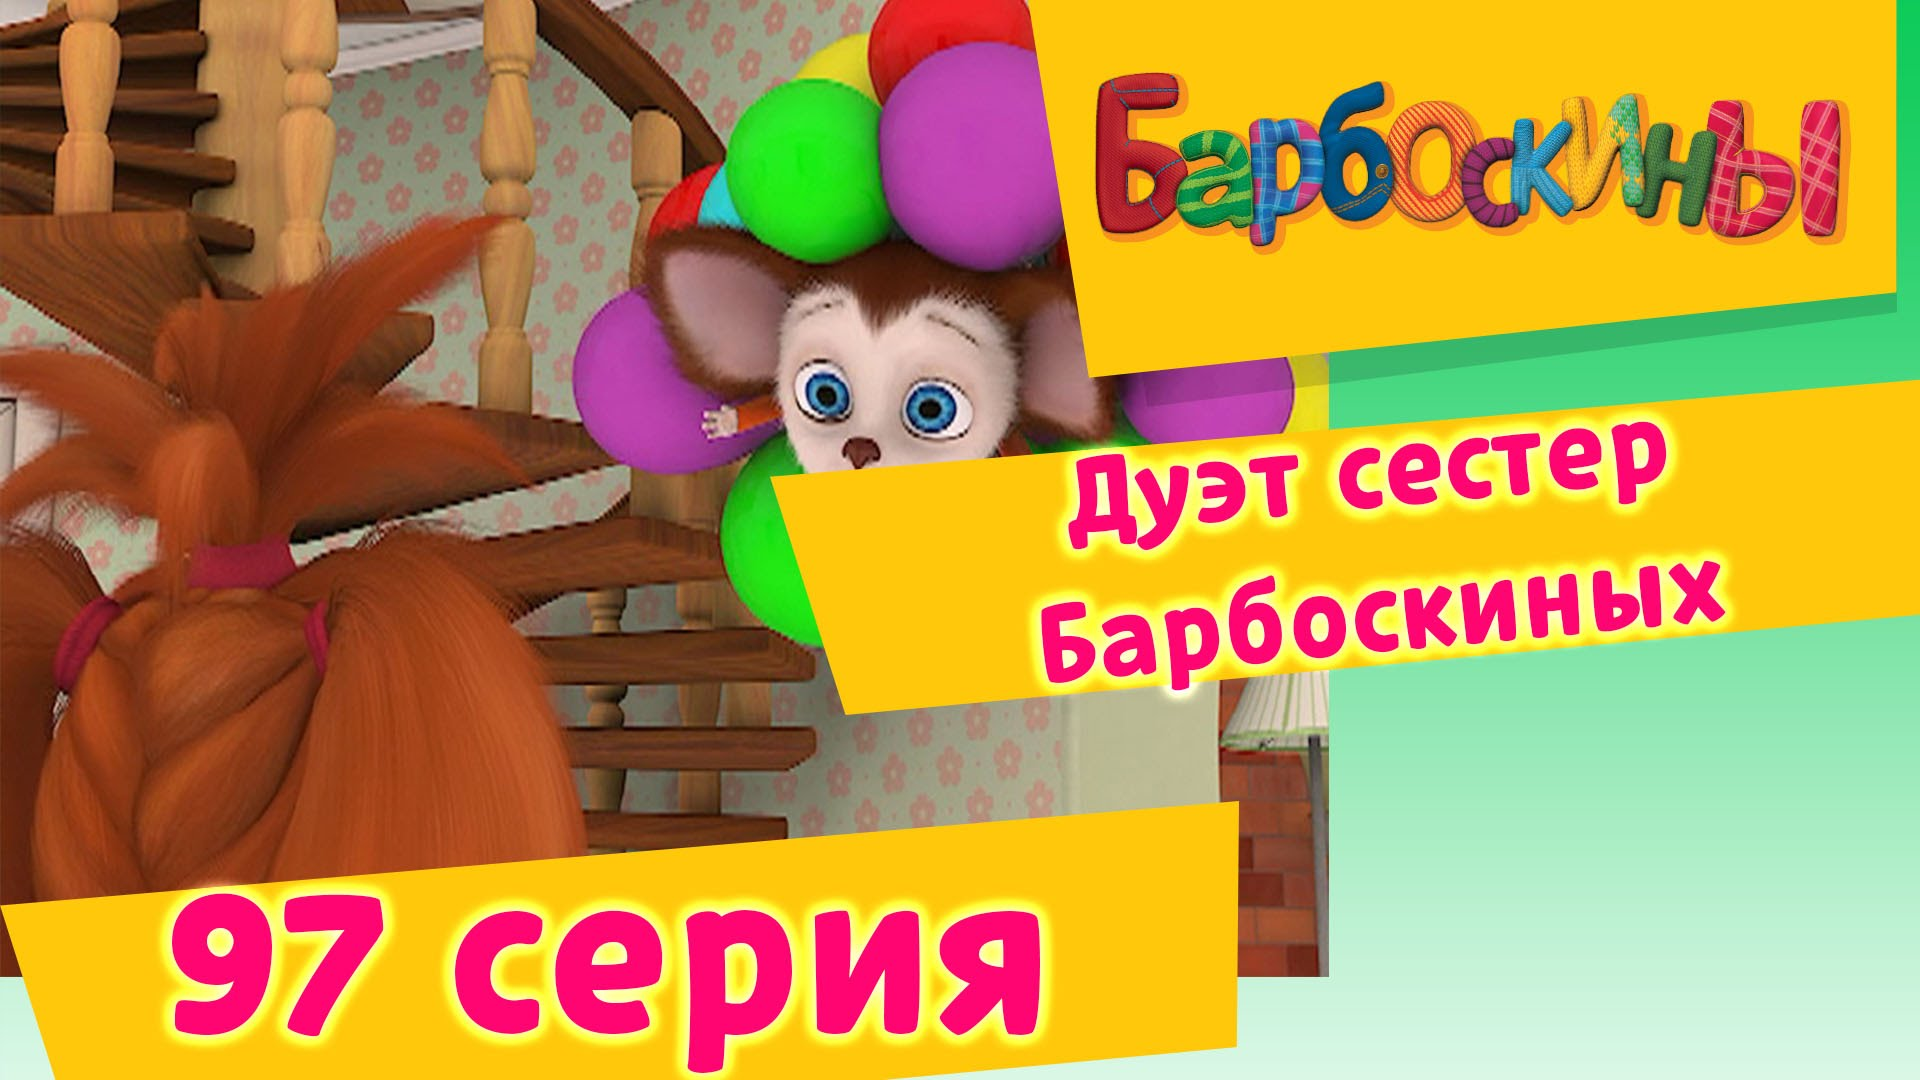 Барбоскины — 97 Серия. Дуэт сестер Барбоскиных